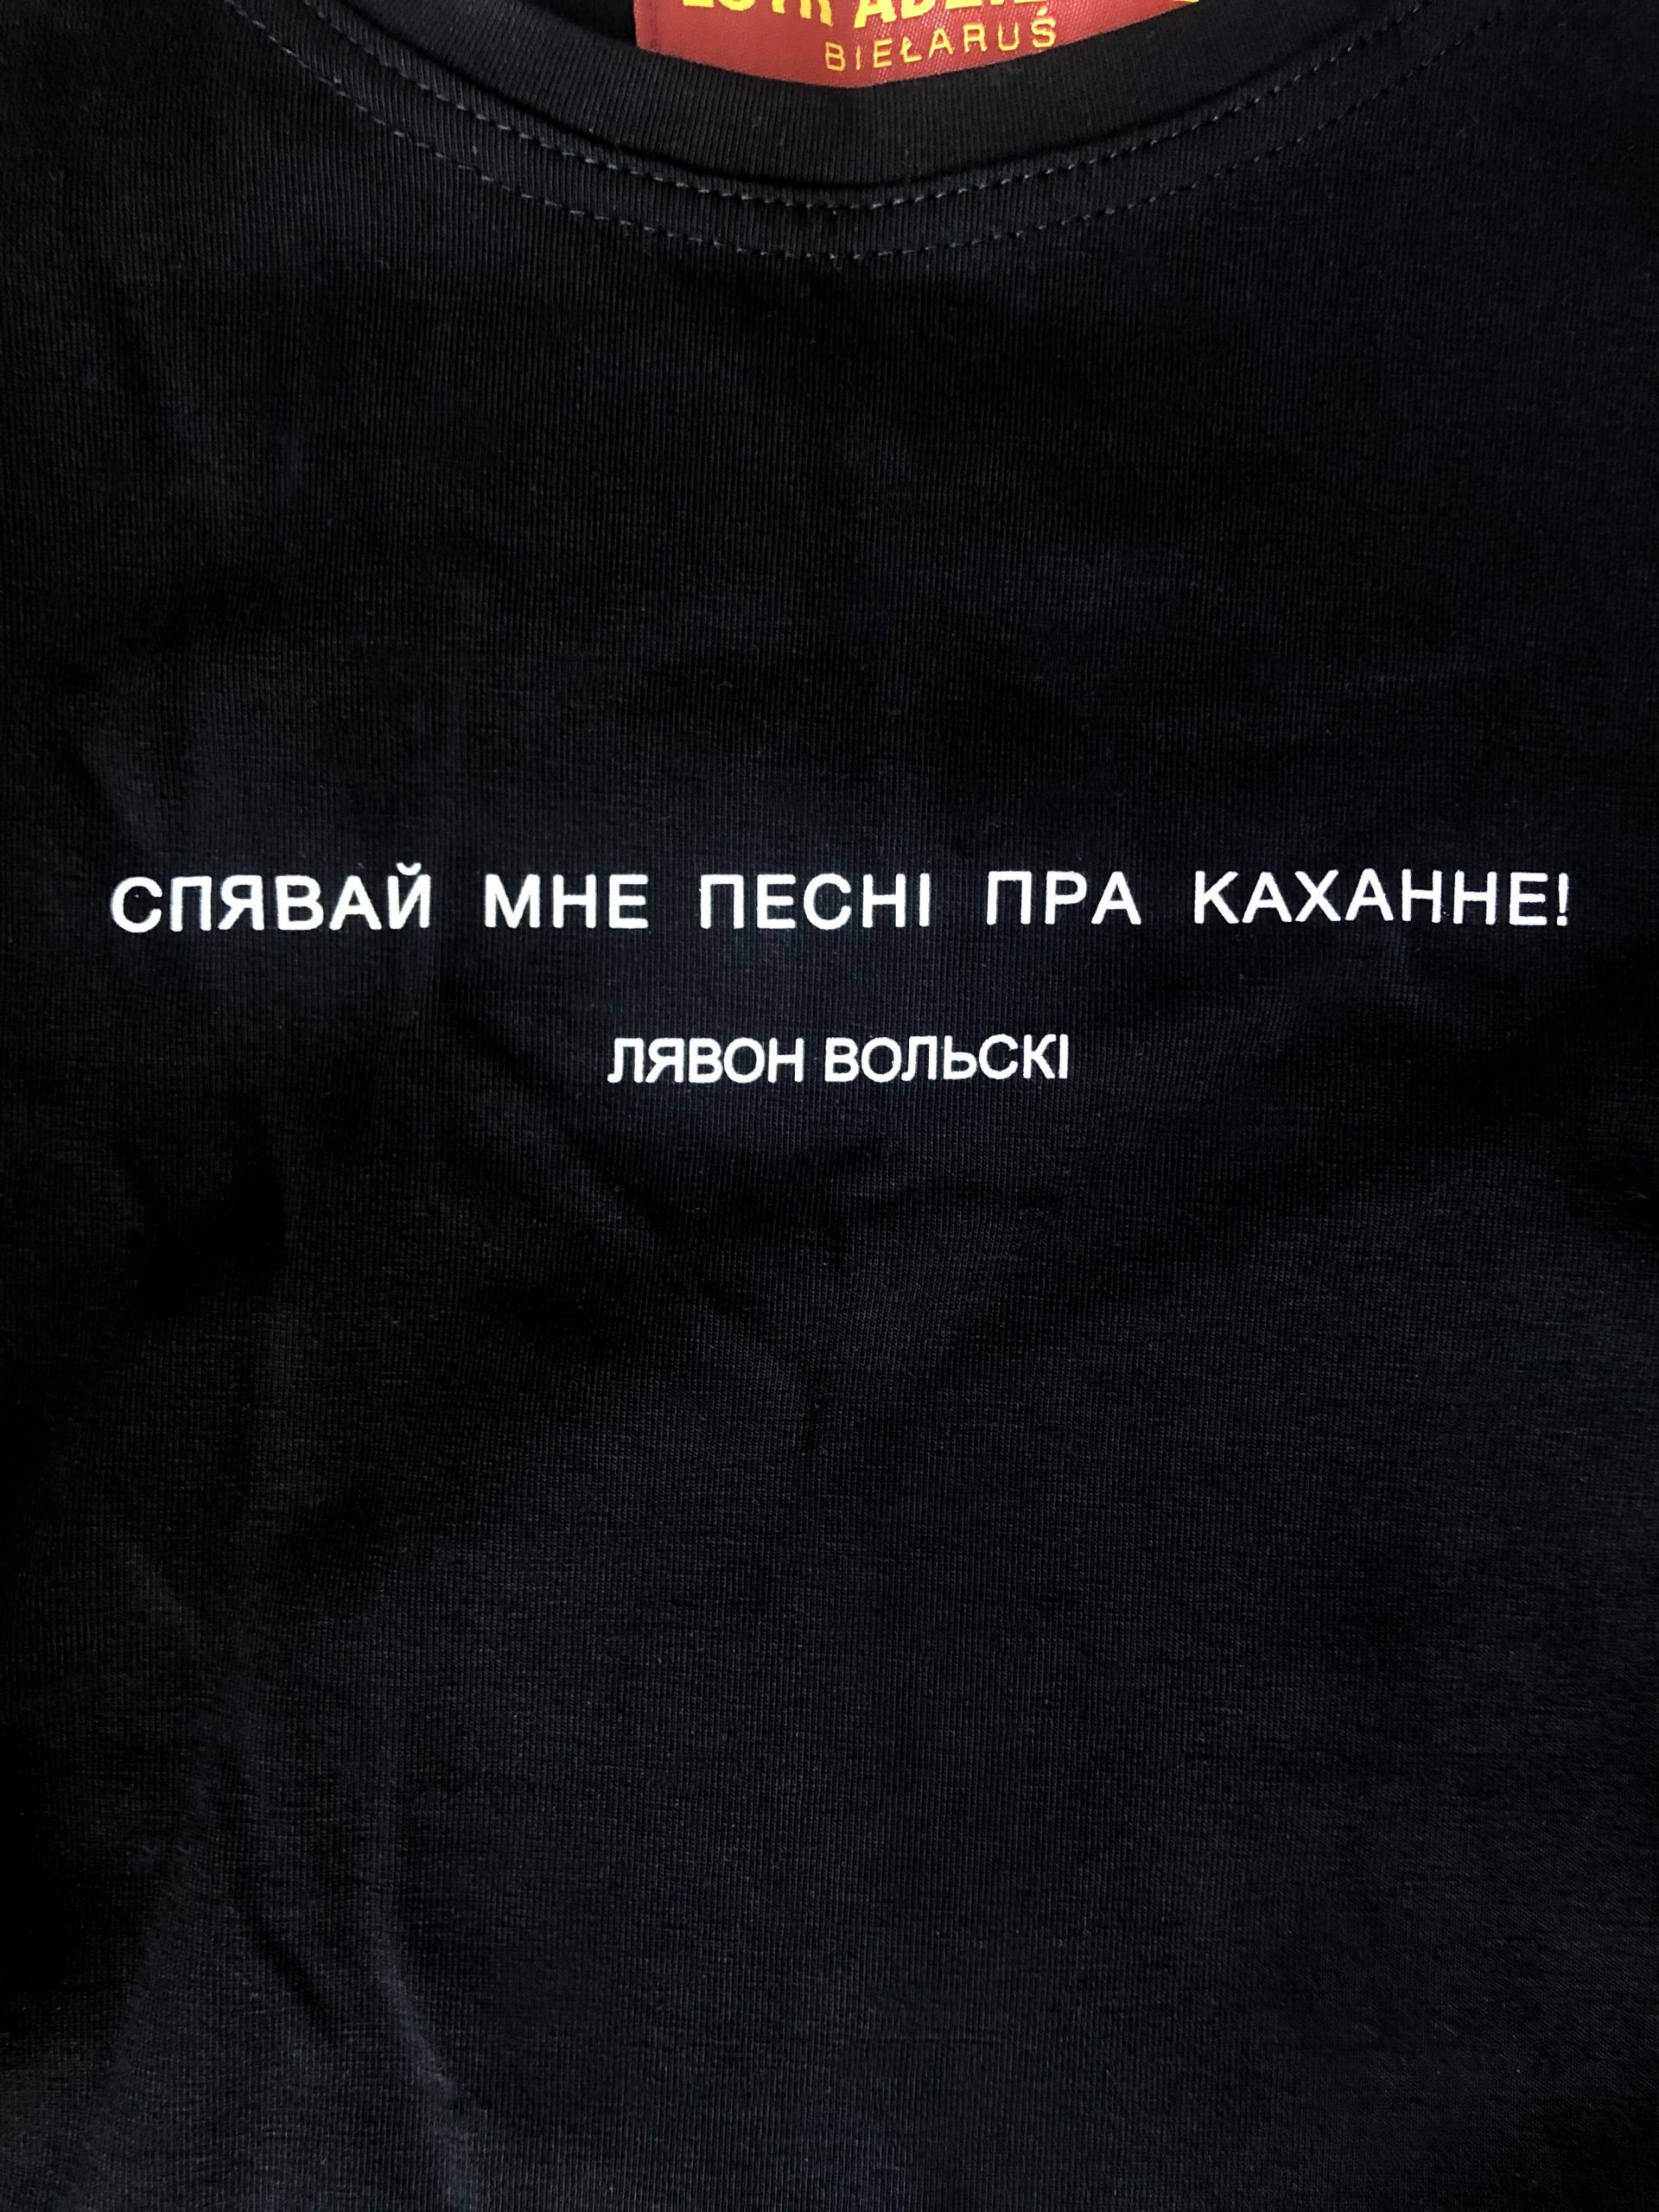 "Цішотка жаночая ""Вольскі"""